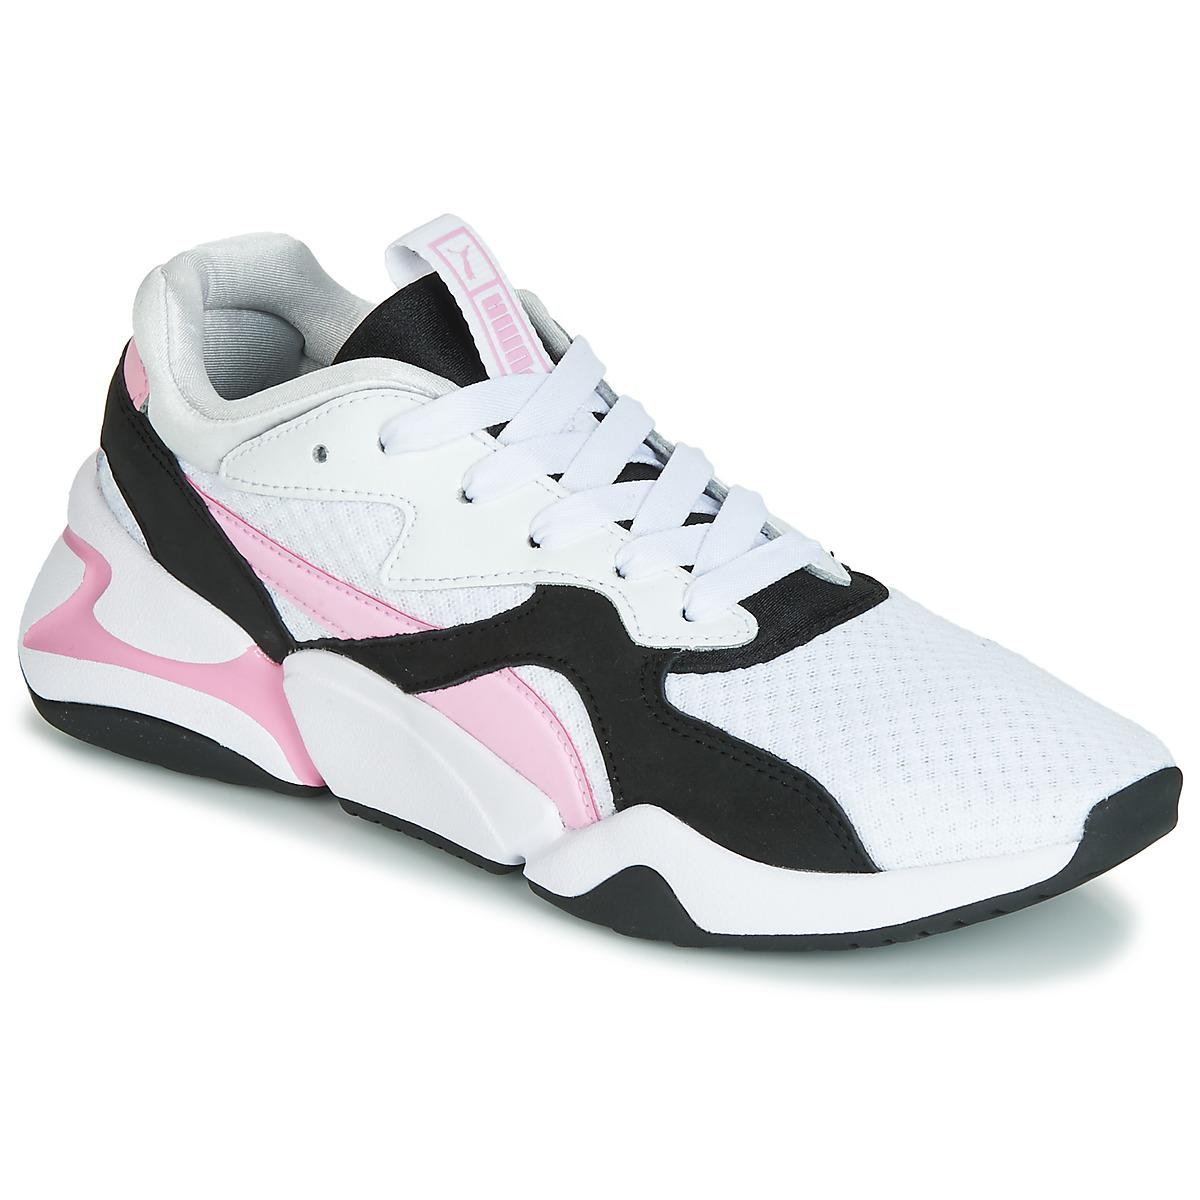 PUMA Wn Nova 90 s Bloc.wh-lilac Women s Shoes (trainers) In White in ... 86cfa1f7b